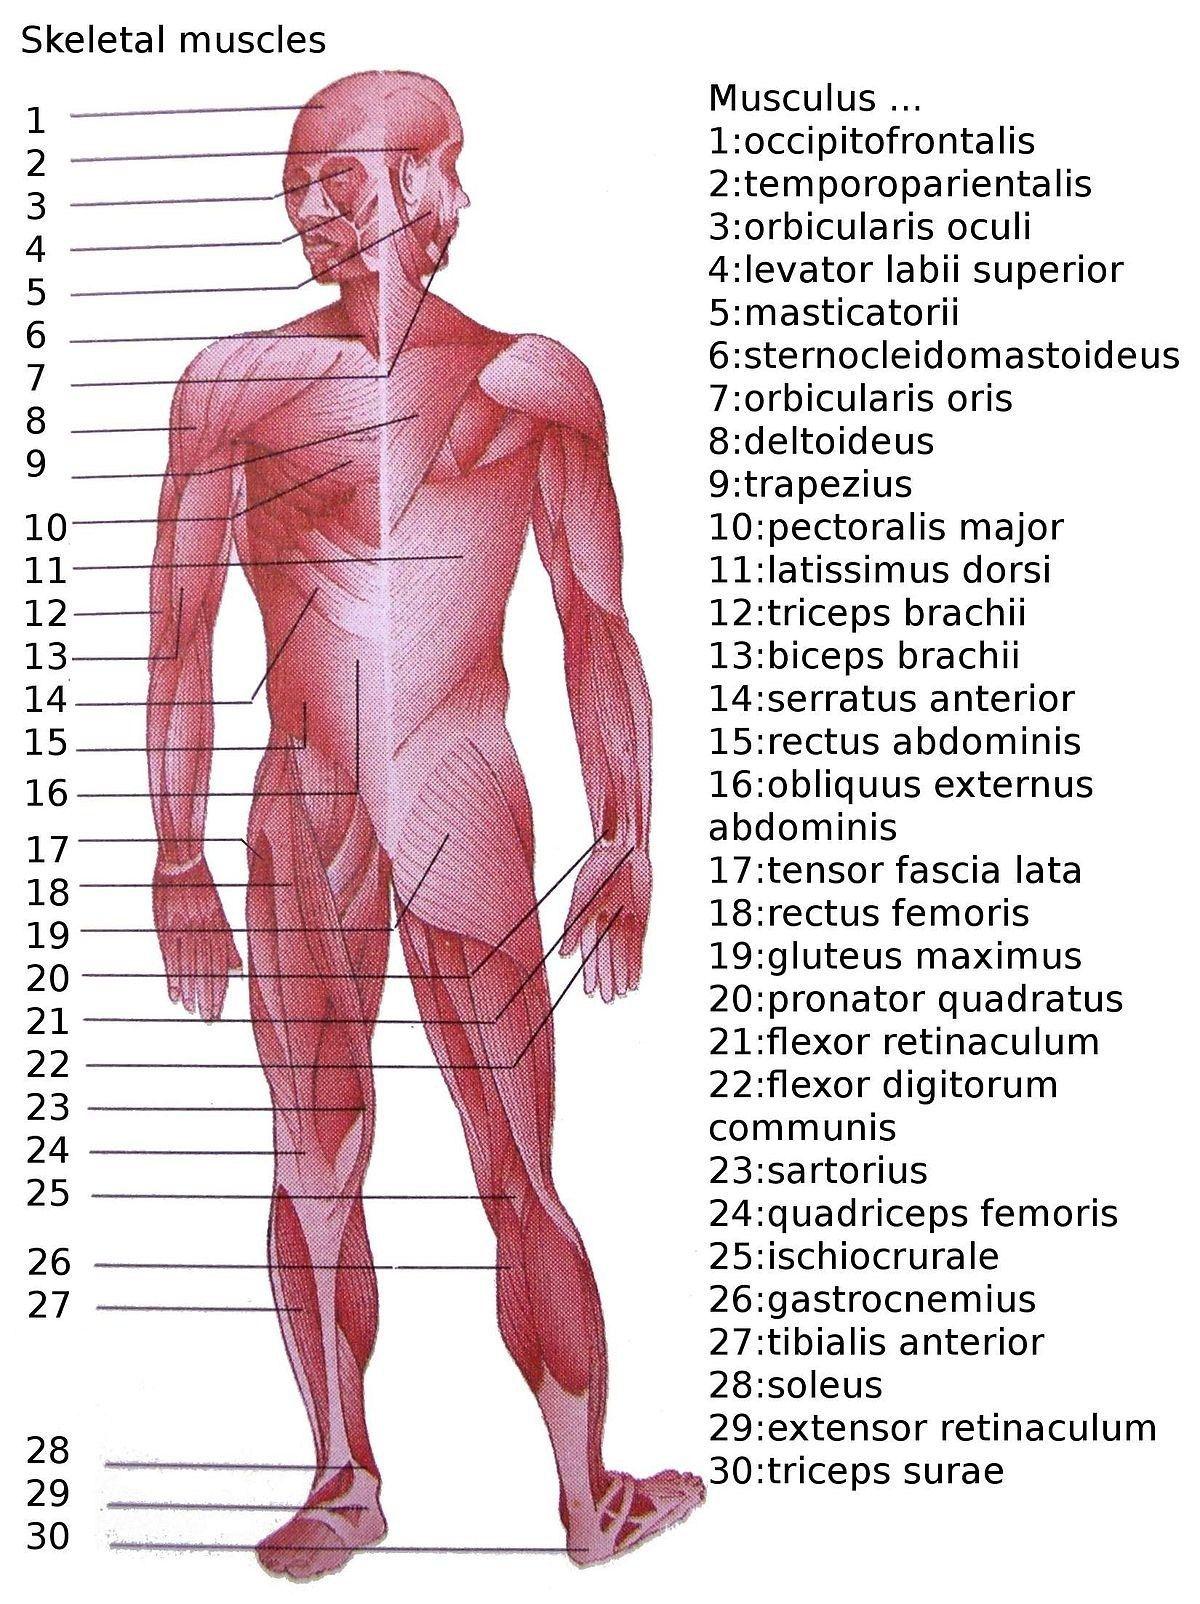 Human Anatomy Torso Diagram List Of Skeletal Muscles Of The Human Body Wikipedia Koibana Info Human Muscle Anatomy Muscle Anatomy Human Muscular System